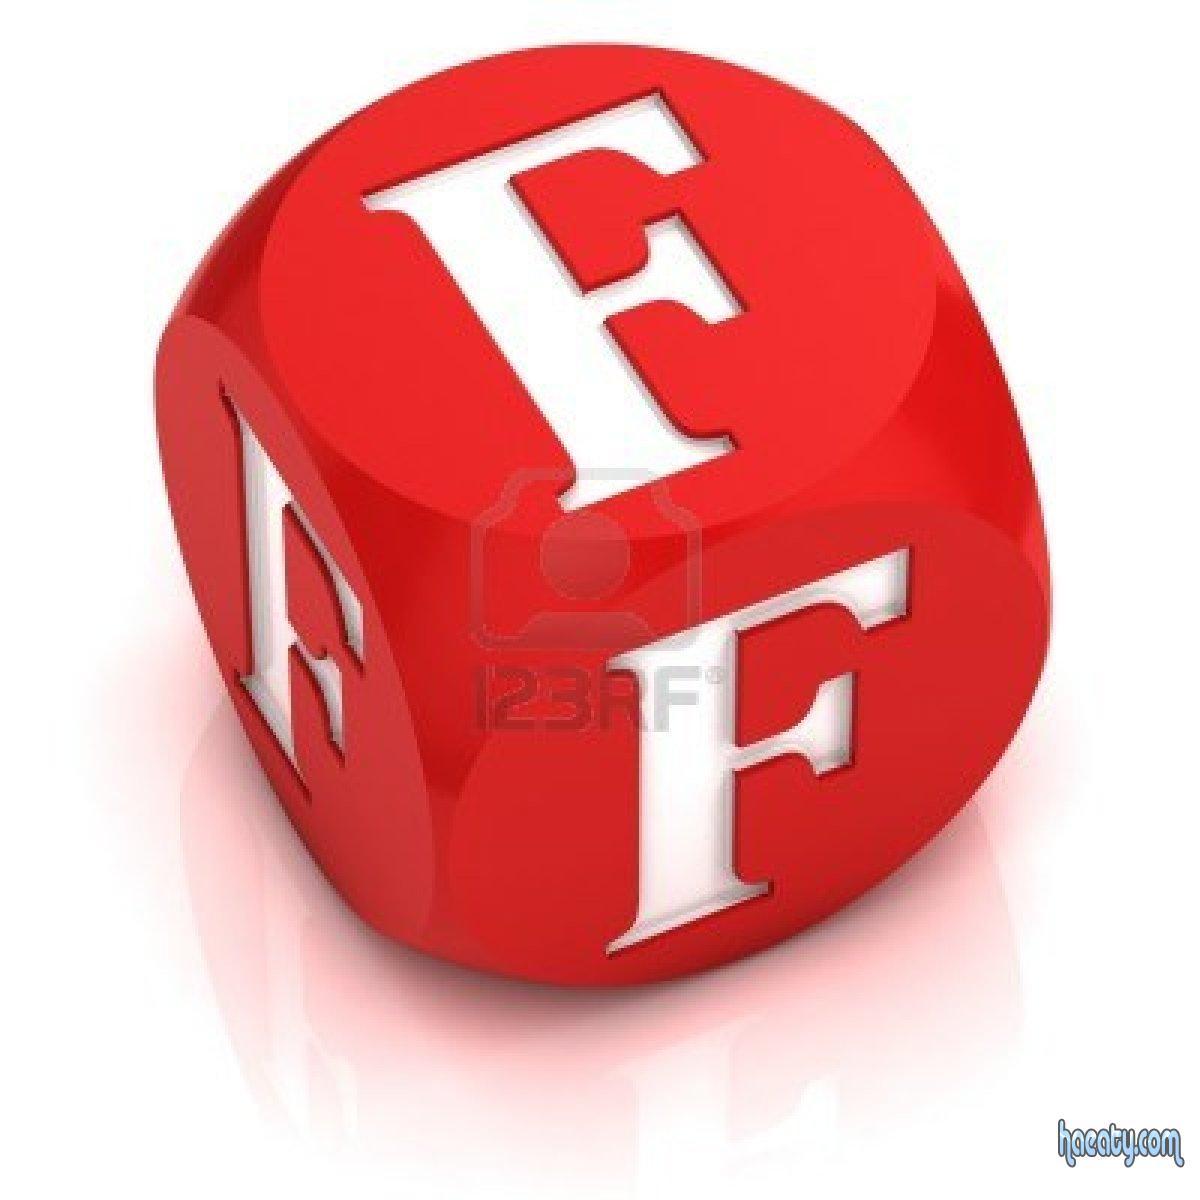 صور حرف F , صور حرف F مزخرفة , خلفيات جديدة 2019 letter F pictures new_1420670341_655.j